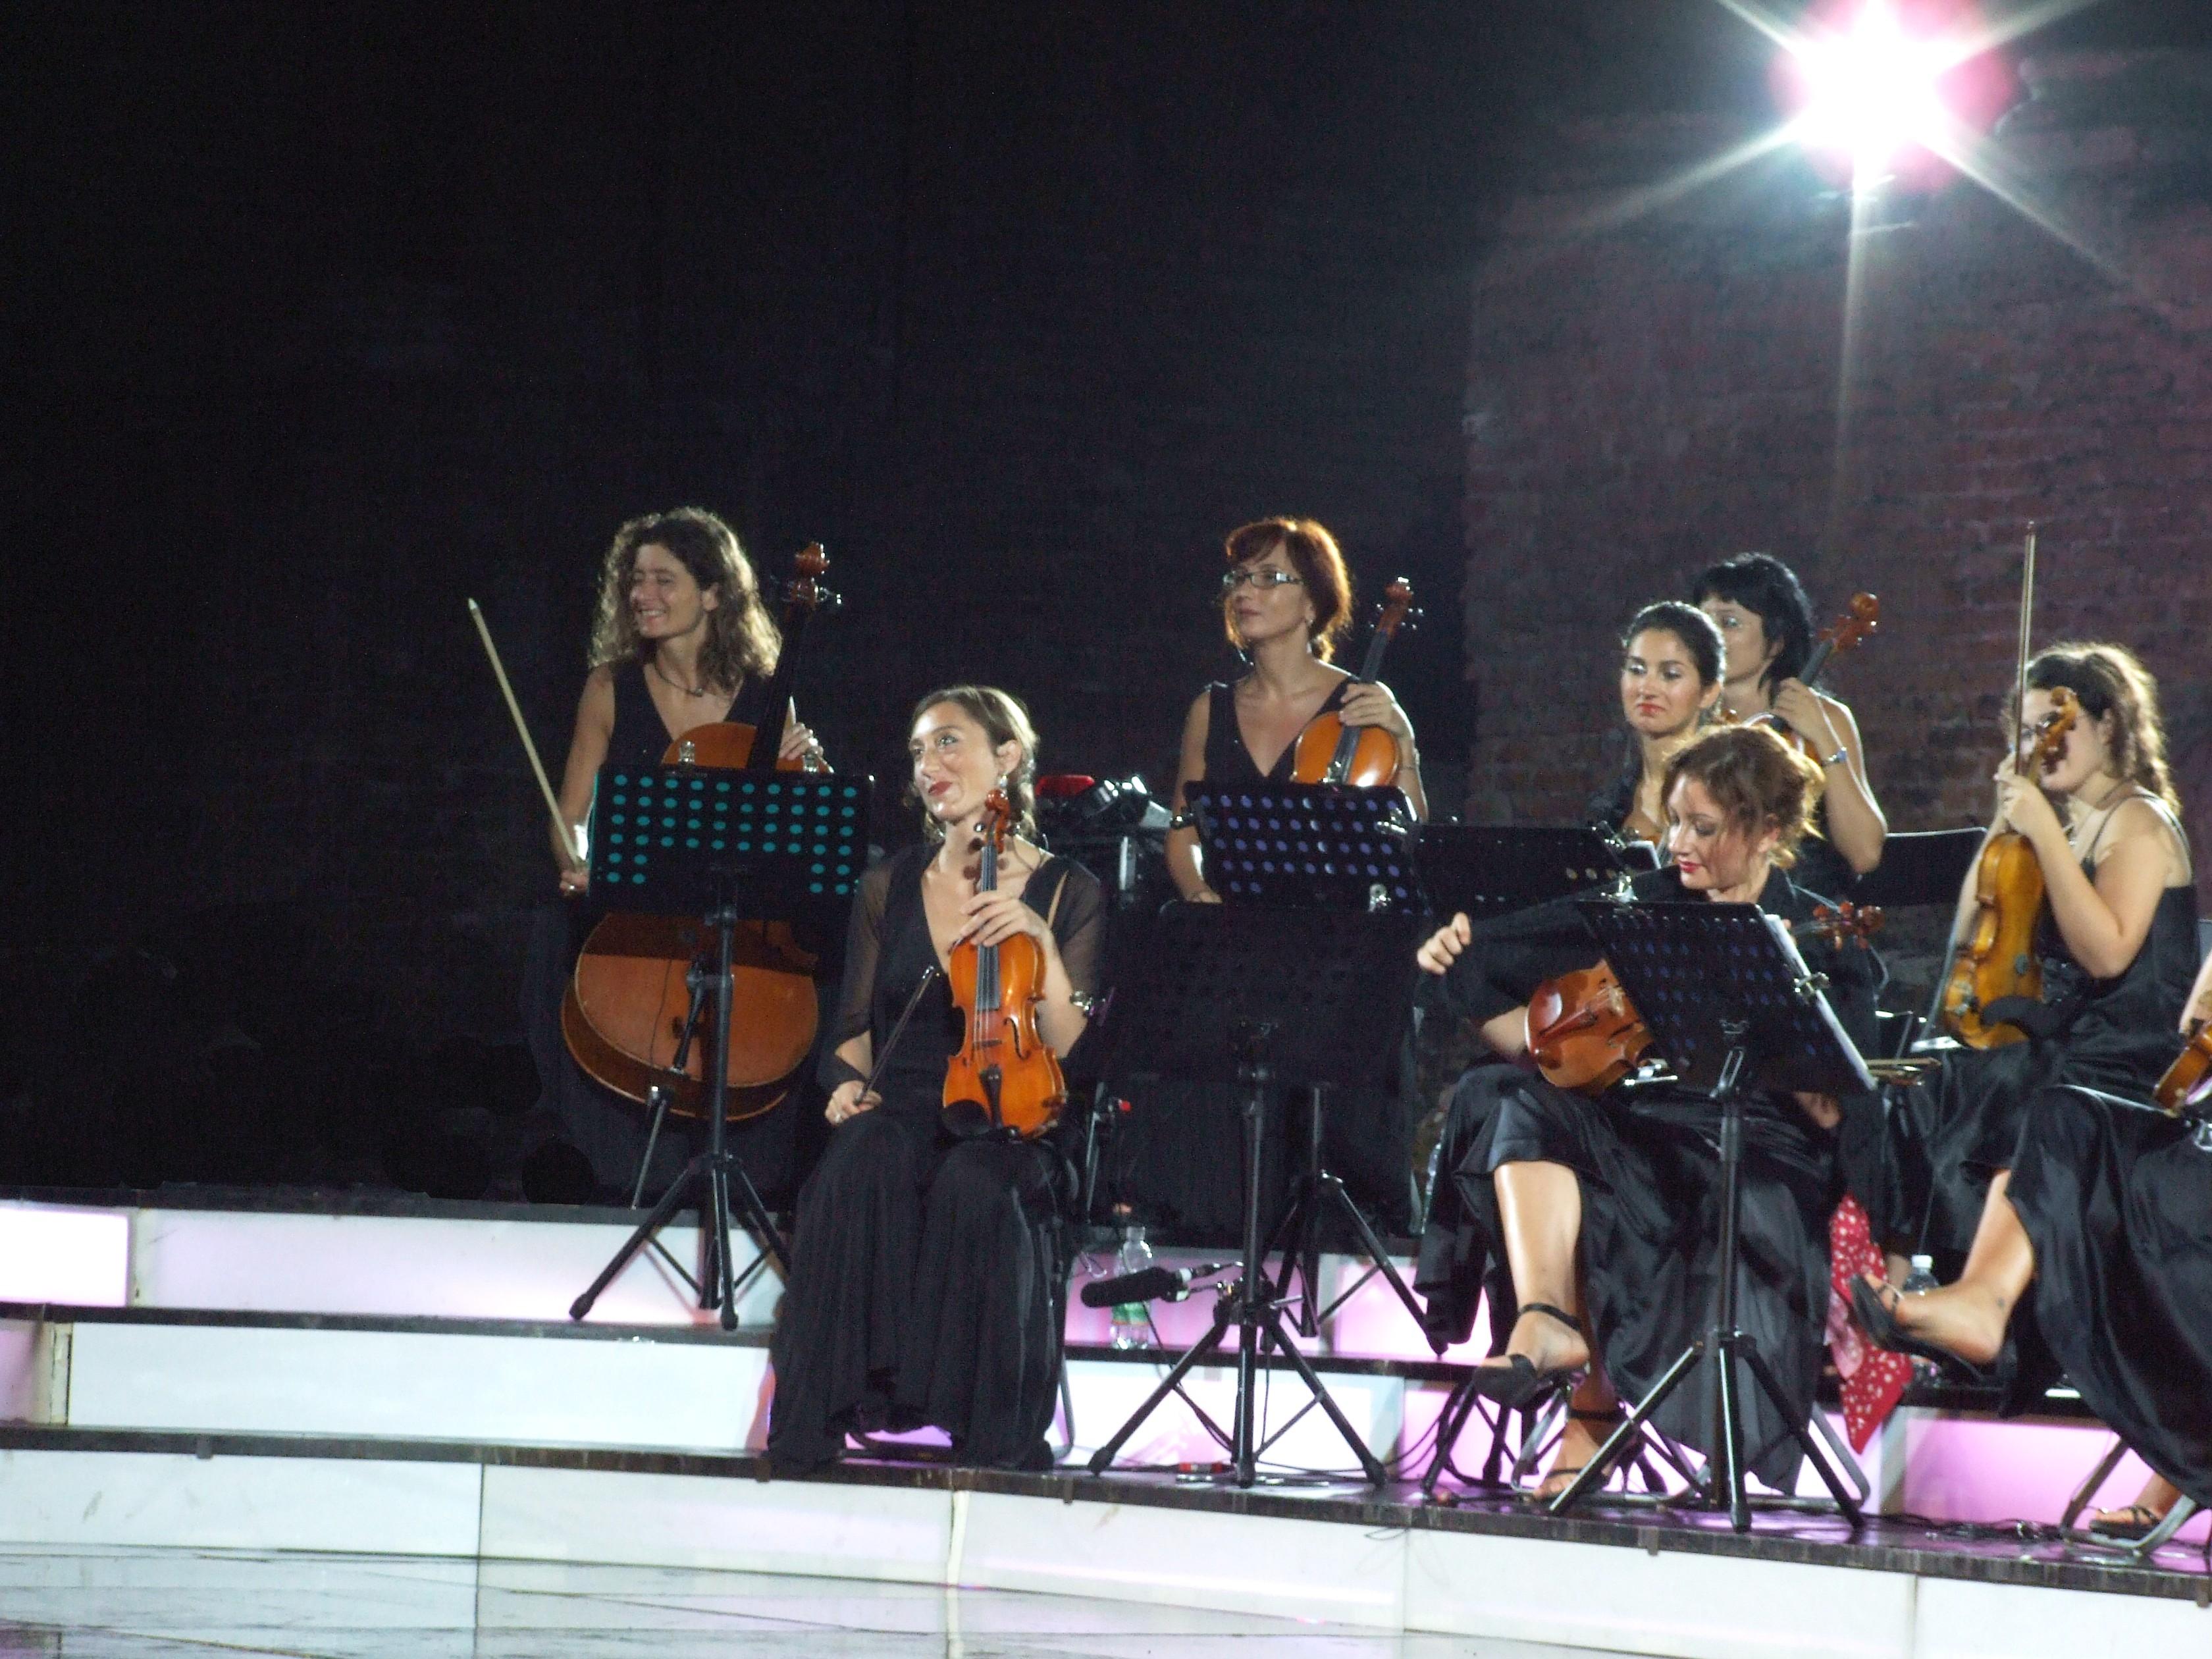 Dscf9304-massimo ranieri concert 2009 taormina-sicilia-italy-gnuckx-cc0-hq photo